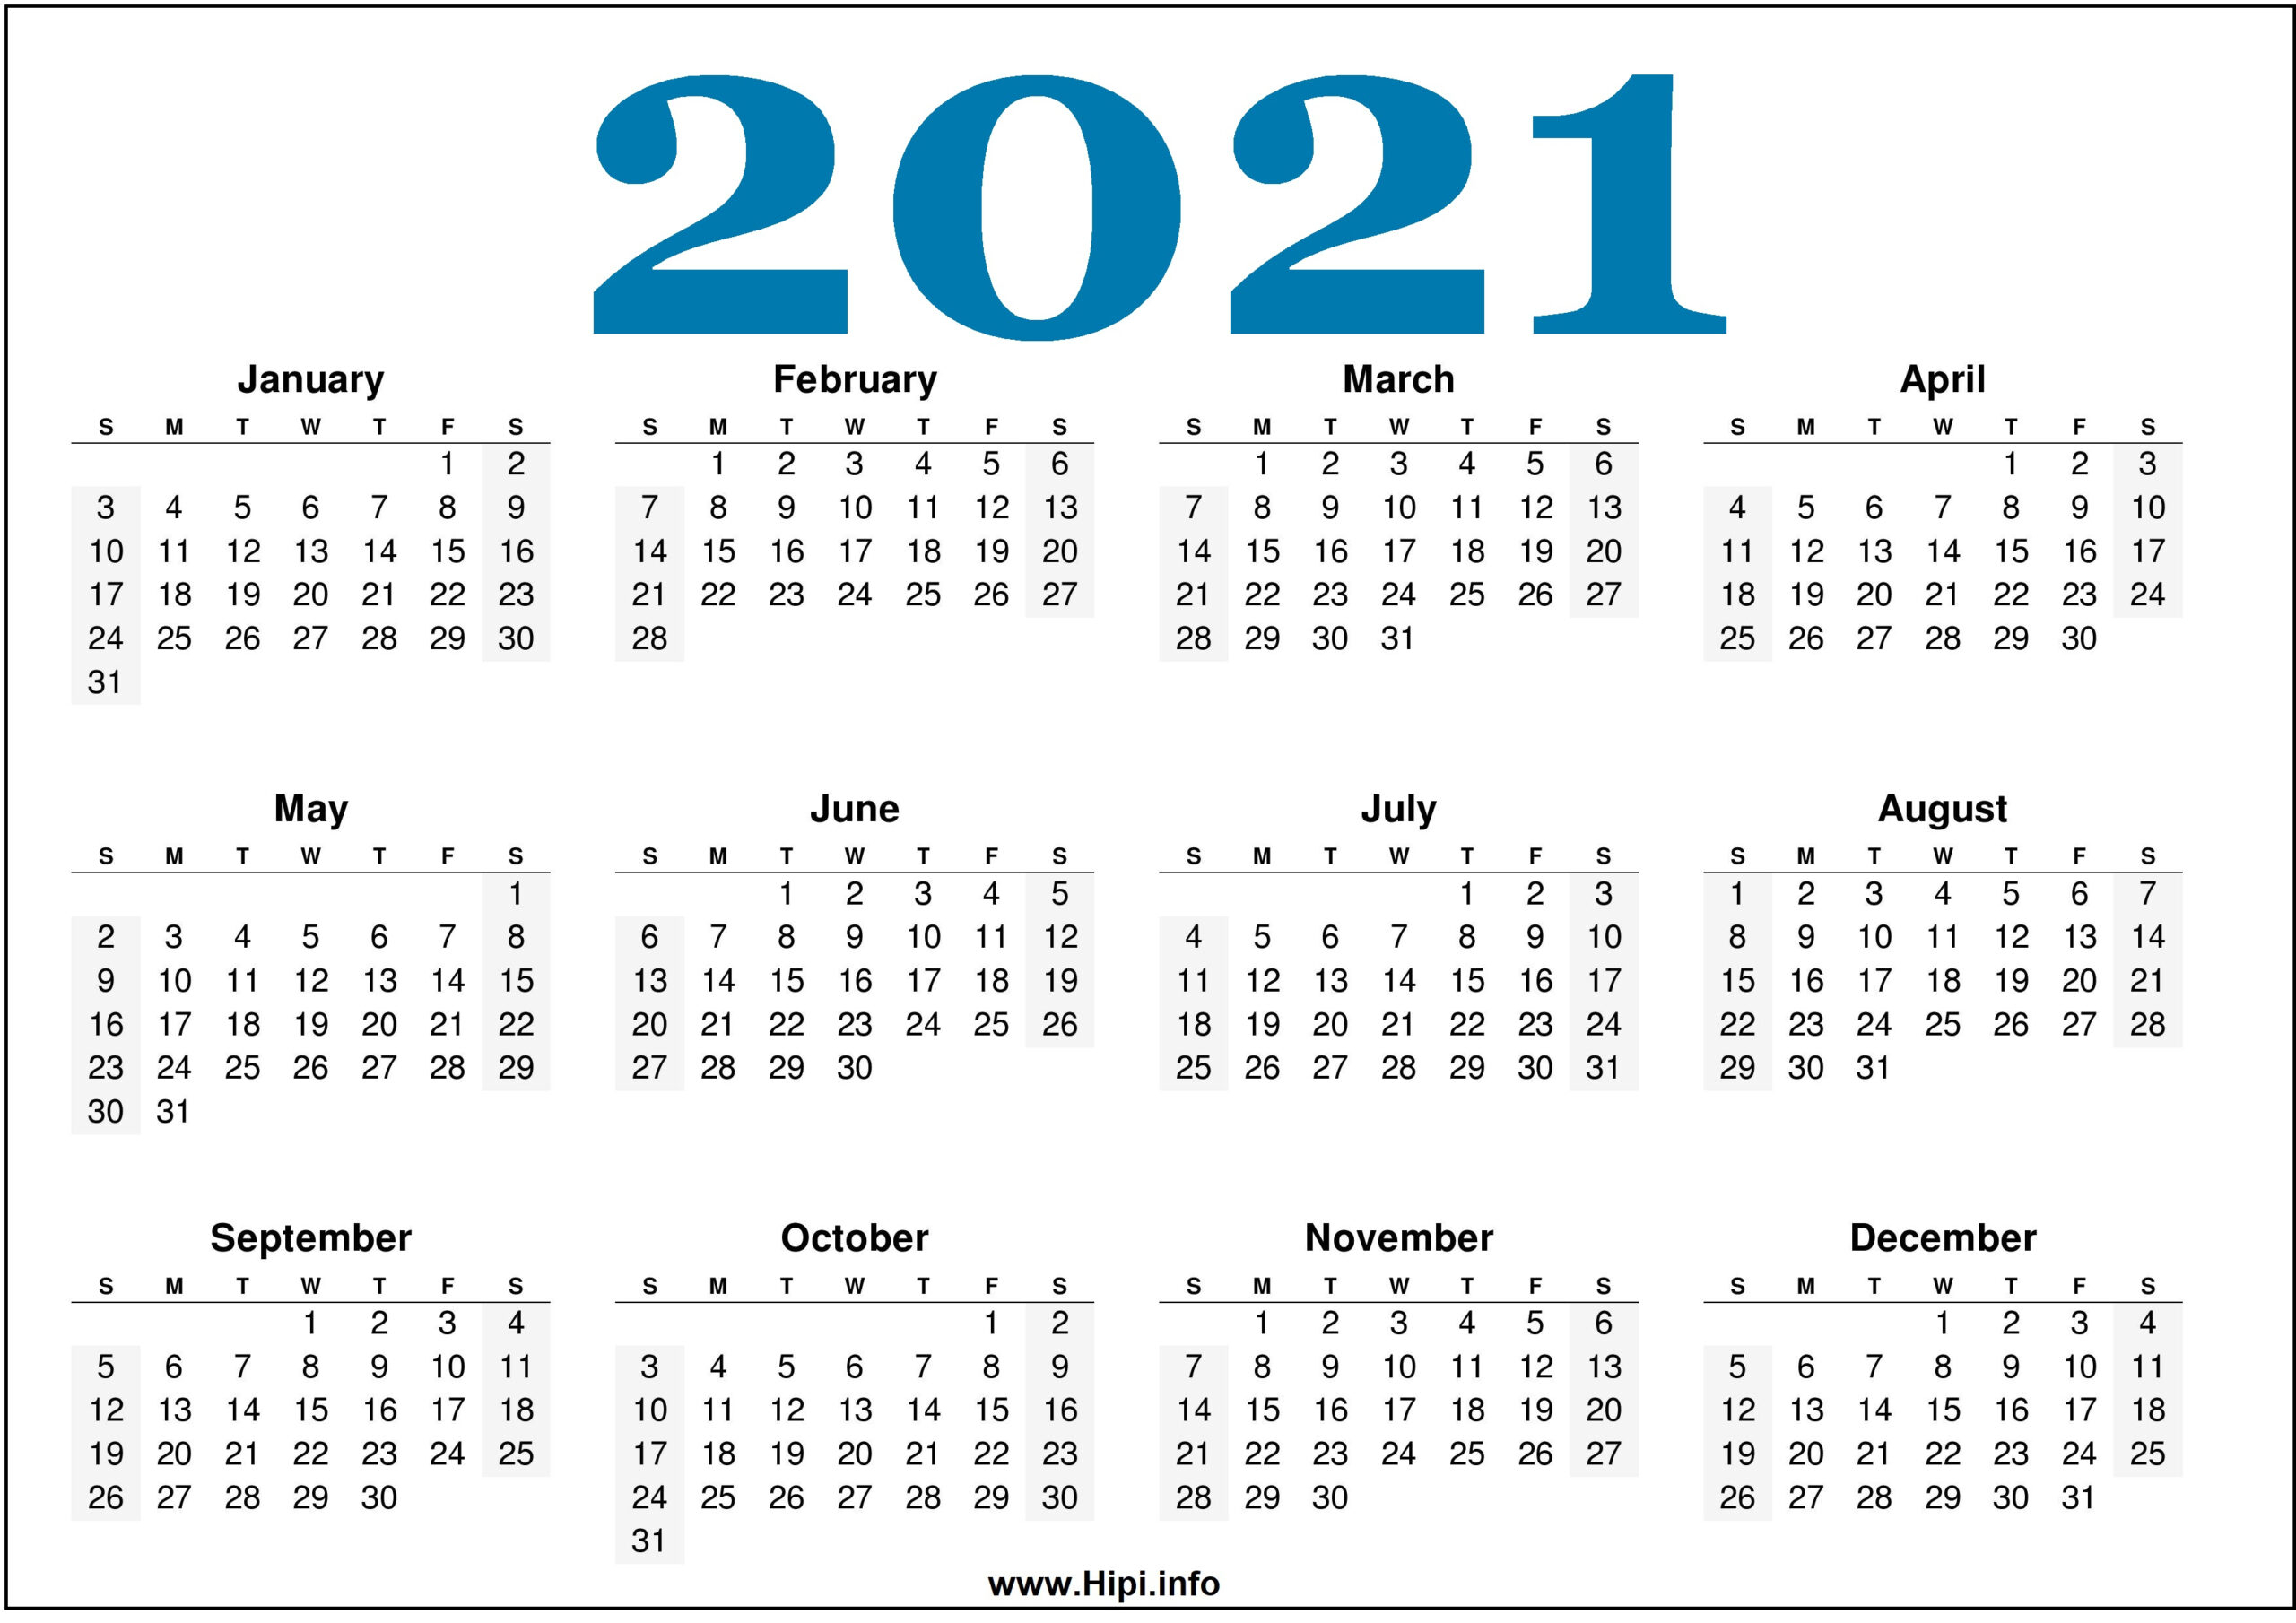 Free Printable 2021 Calendars Horizontal Hipi Info - Easy